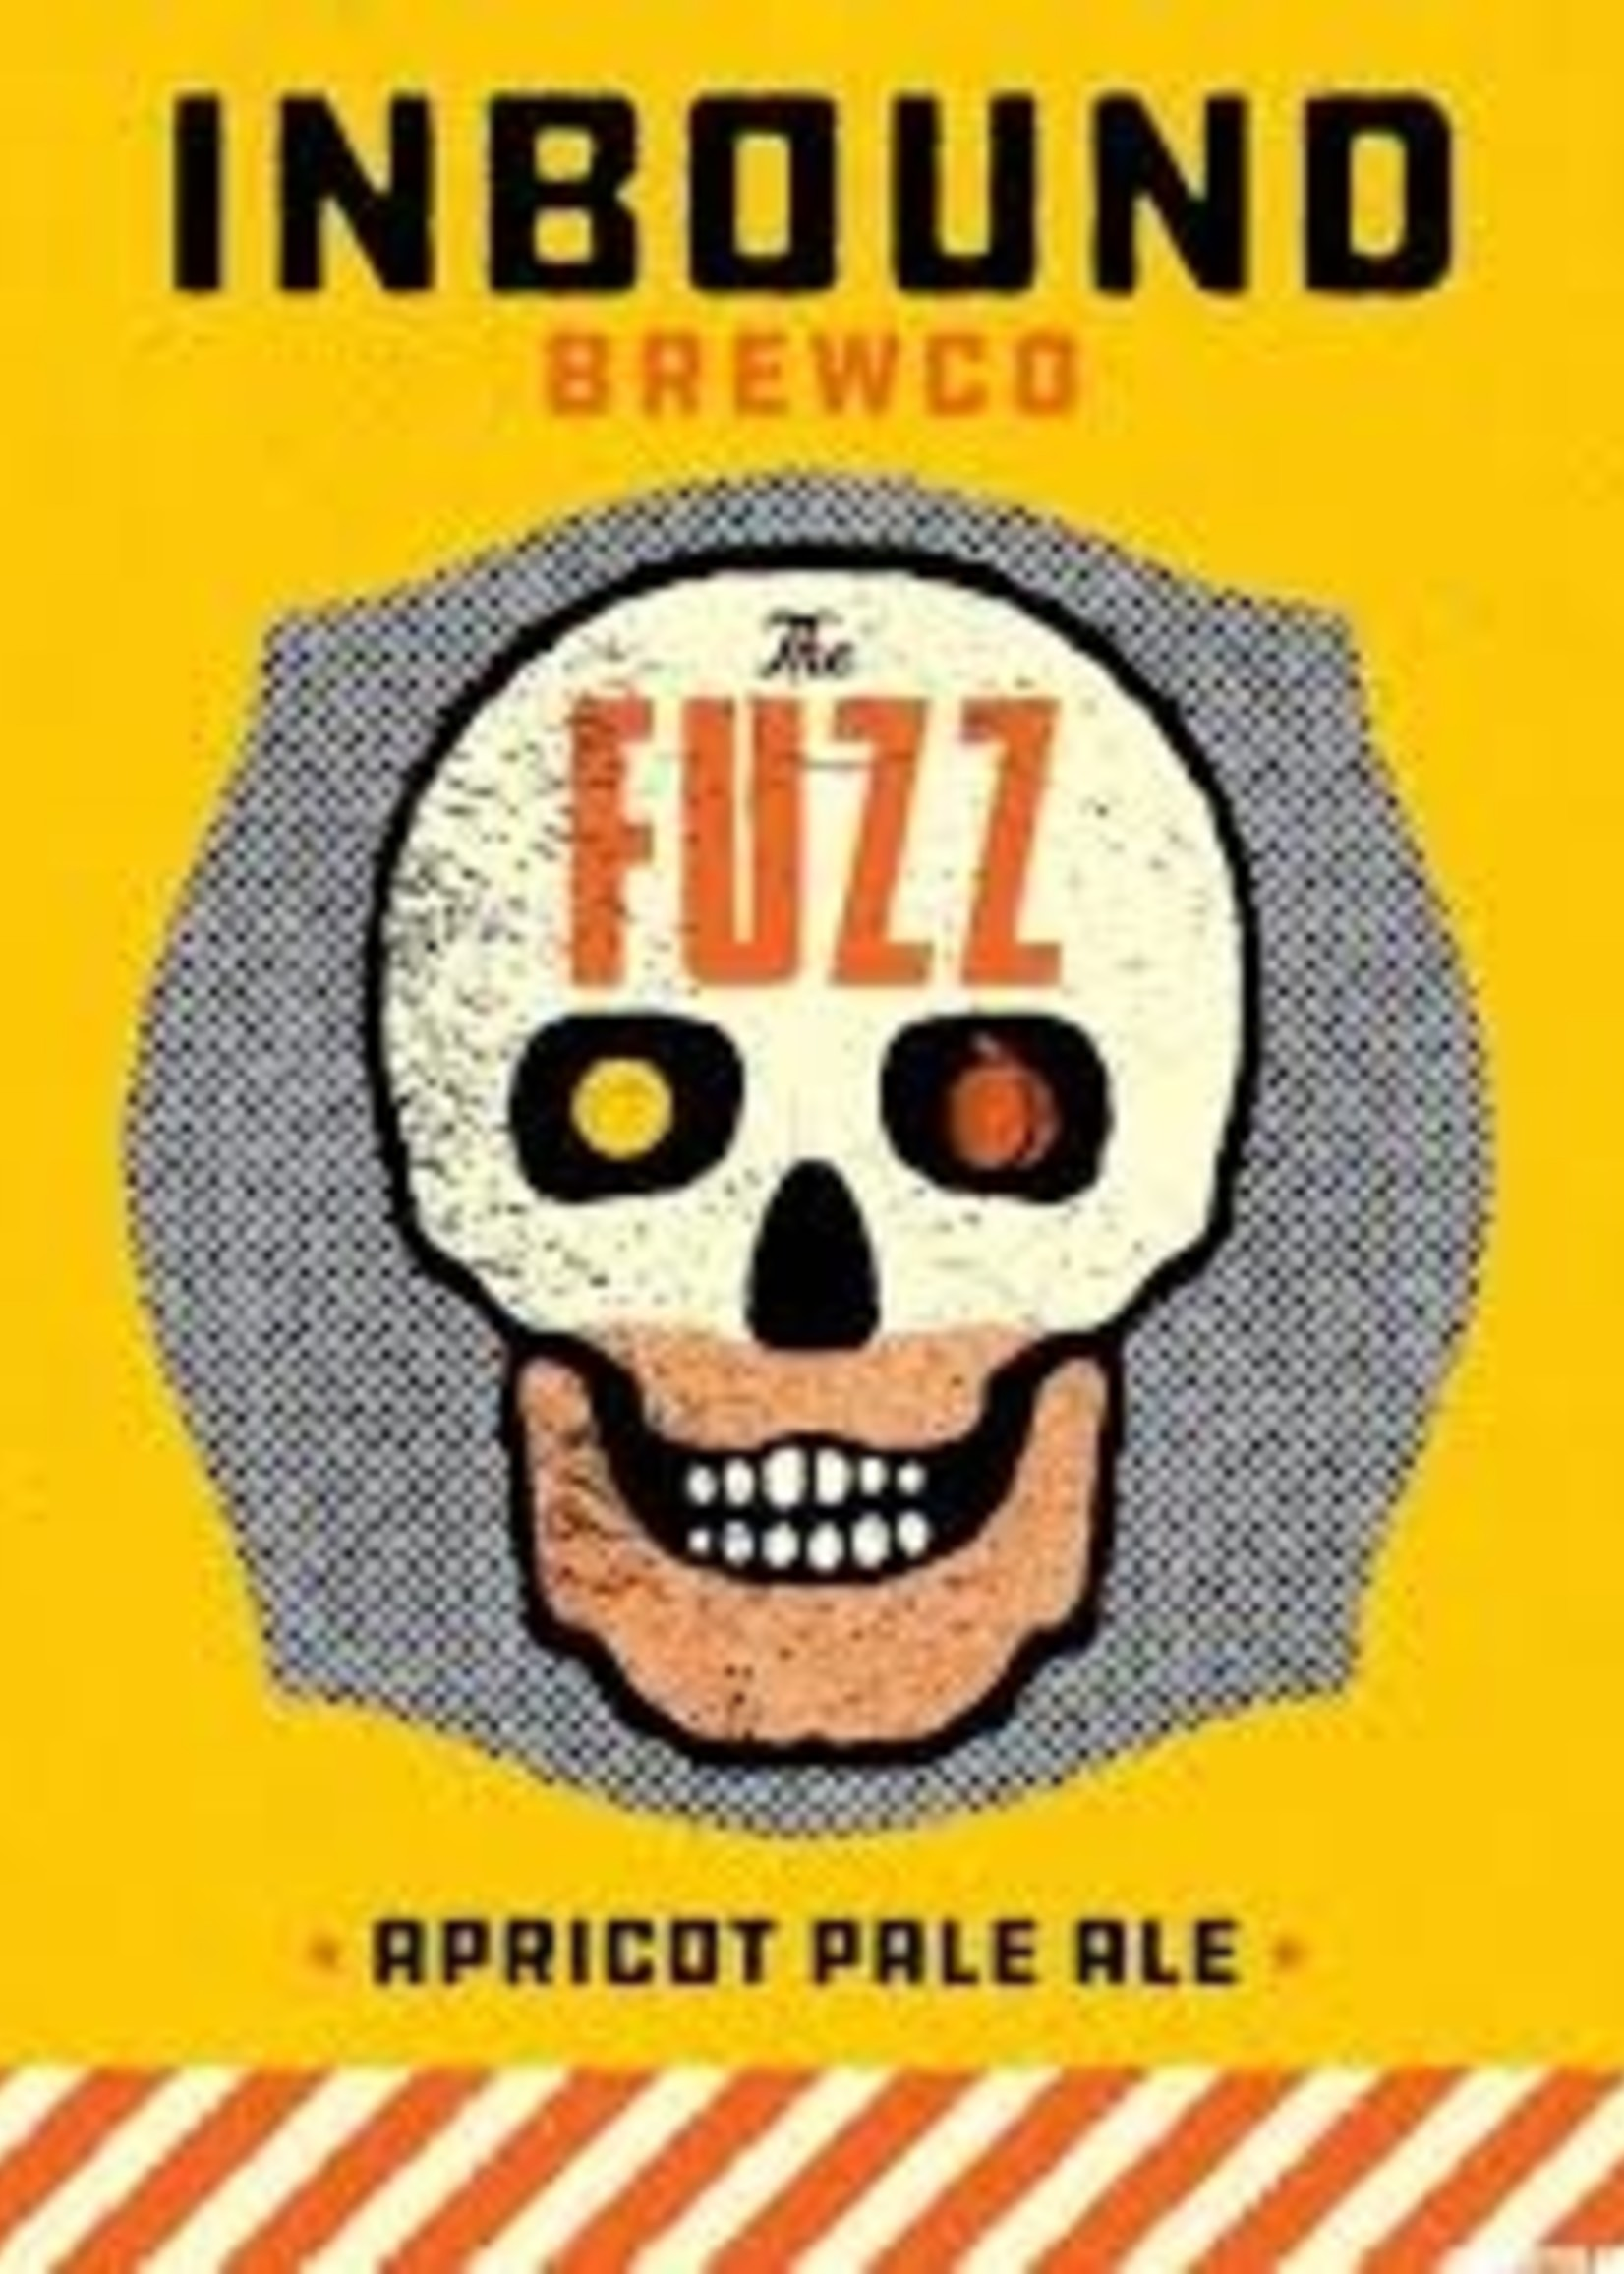 Inbound Fuzz Apricot Pale Ale